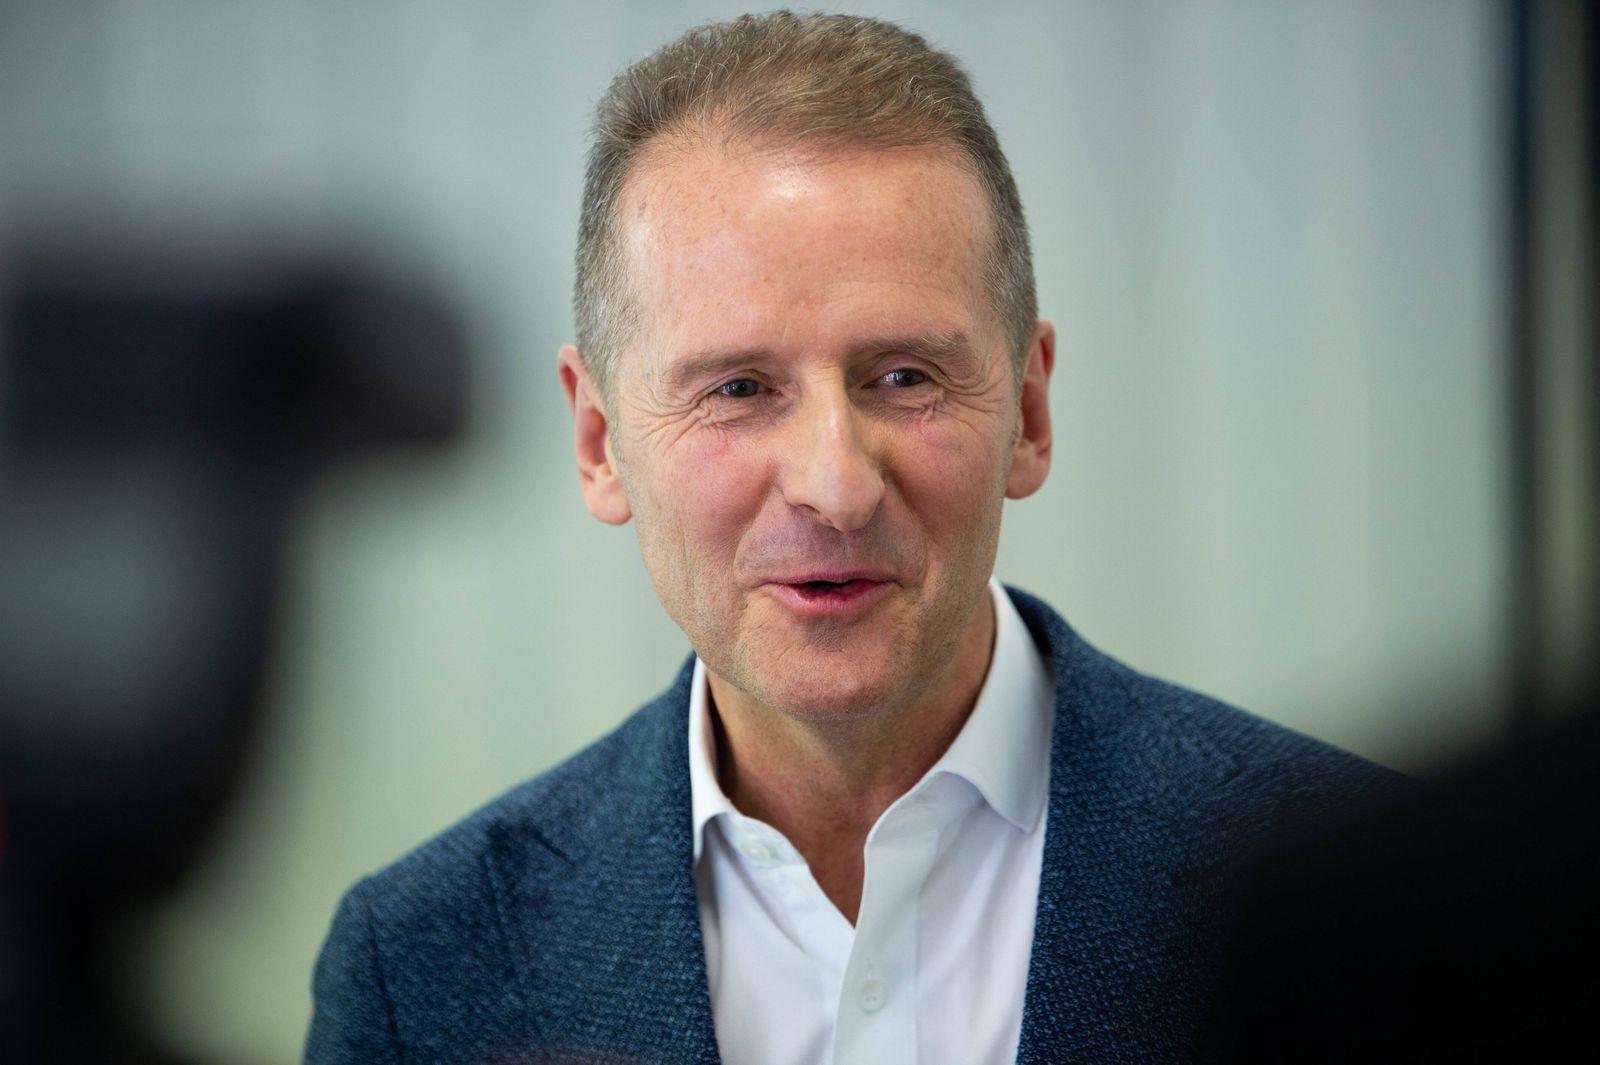 Herbert Diess - VW-Vorstandschef, Maischberger - Die Woche, 18.12.19, *** Herbert Diess VW CEO, Maischberger Die Woche,